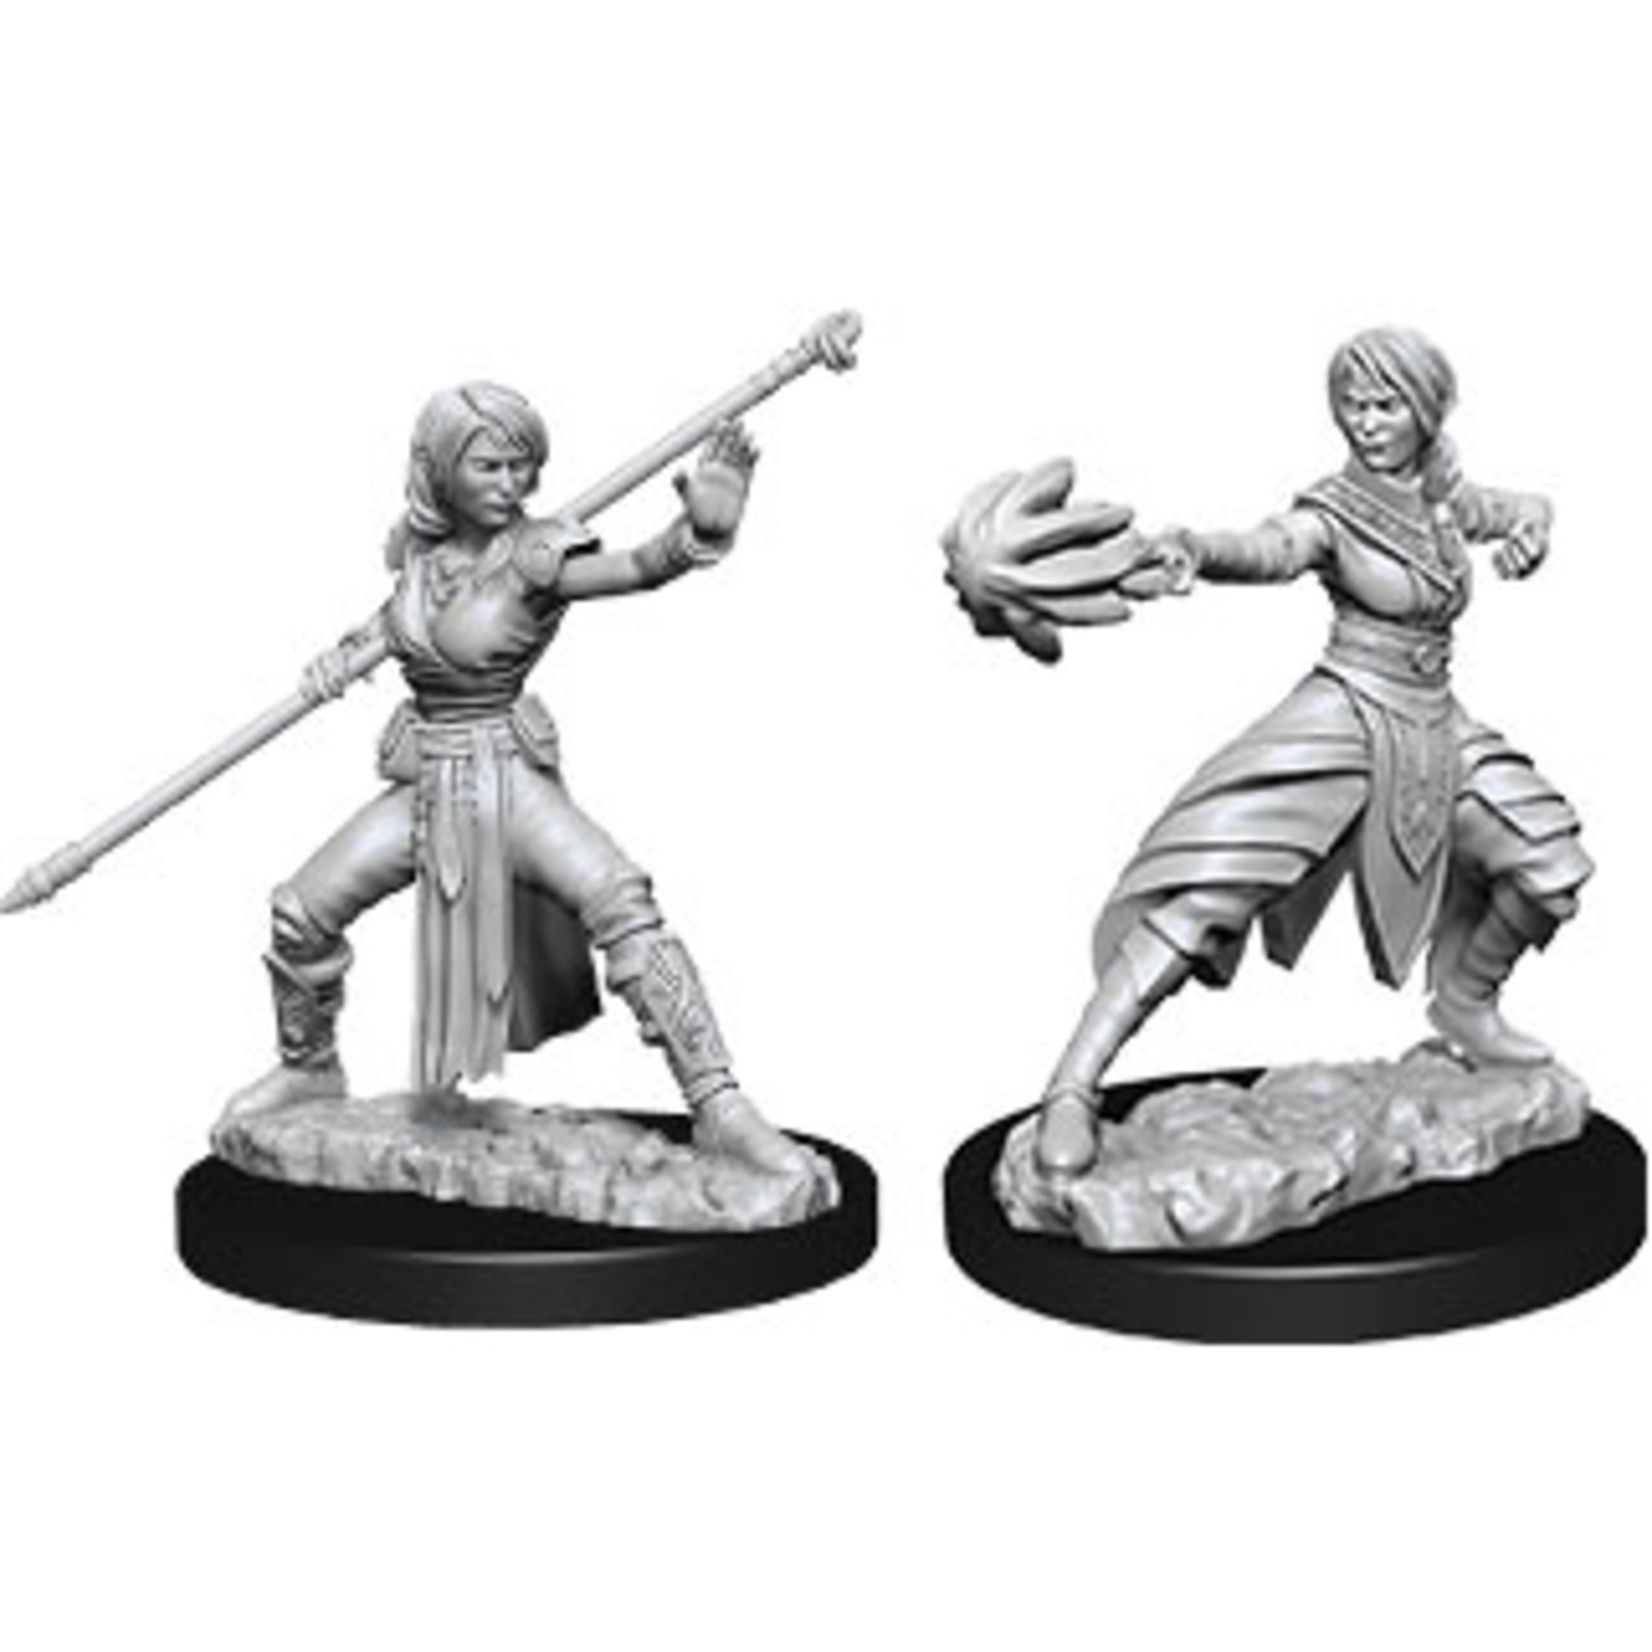 Dungeons & Dragons Nolzur`s Marvelous Unpainted Miniatures: W10 Female Half-Elf Monk